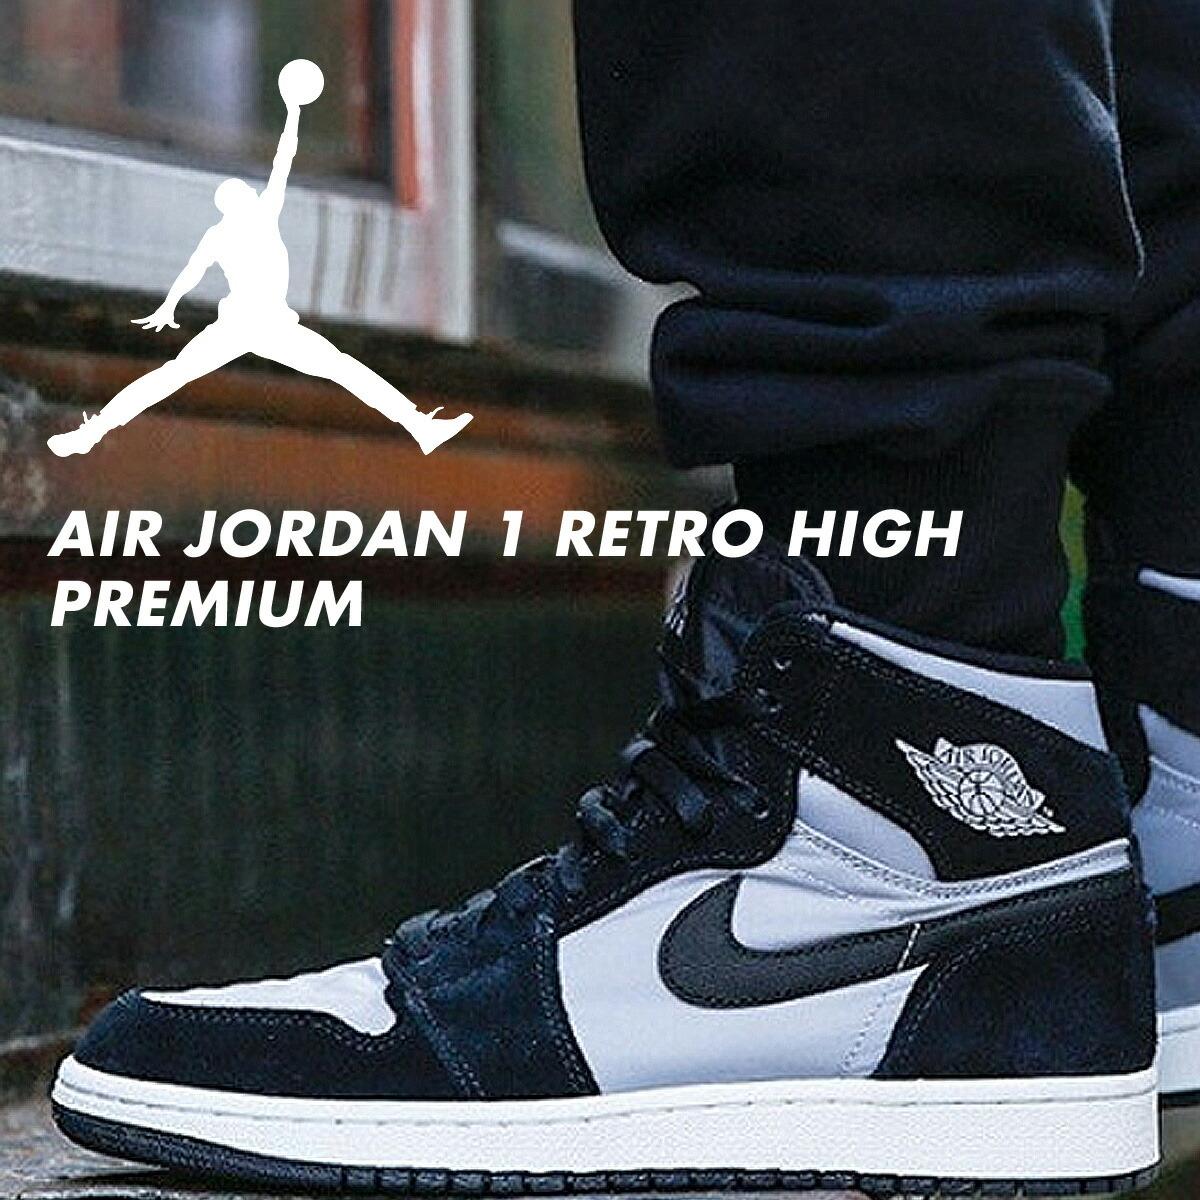 348d6371a9e2 ALLSPORTS  NIKE AIR JORDAN 1 RETRO HIGH PREMIUM Nike Air Jordan 1 ...